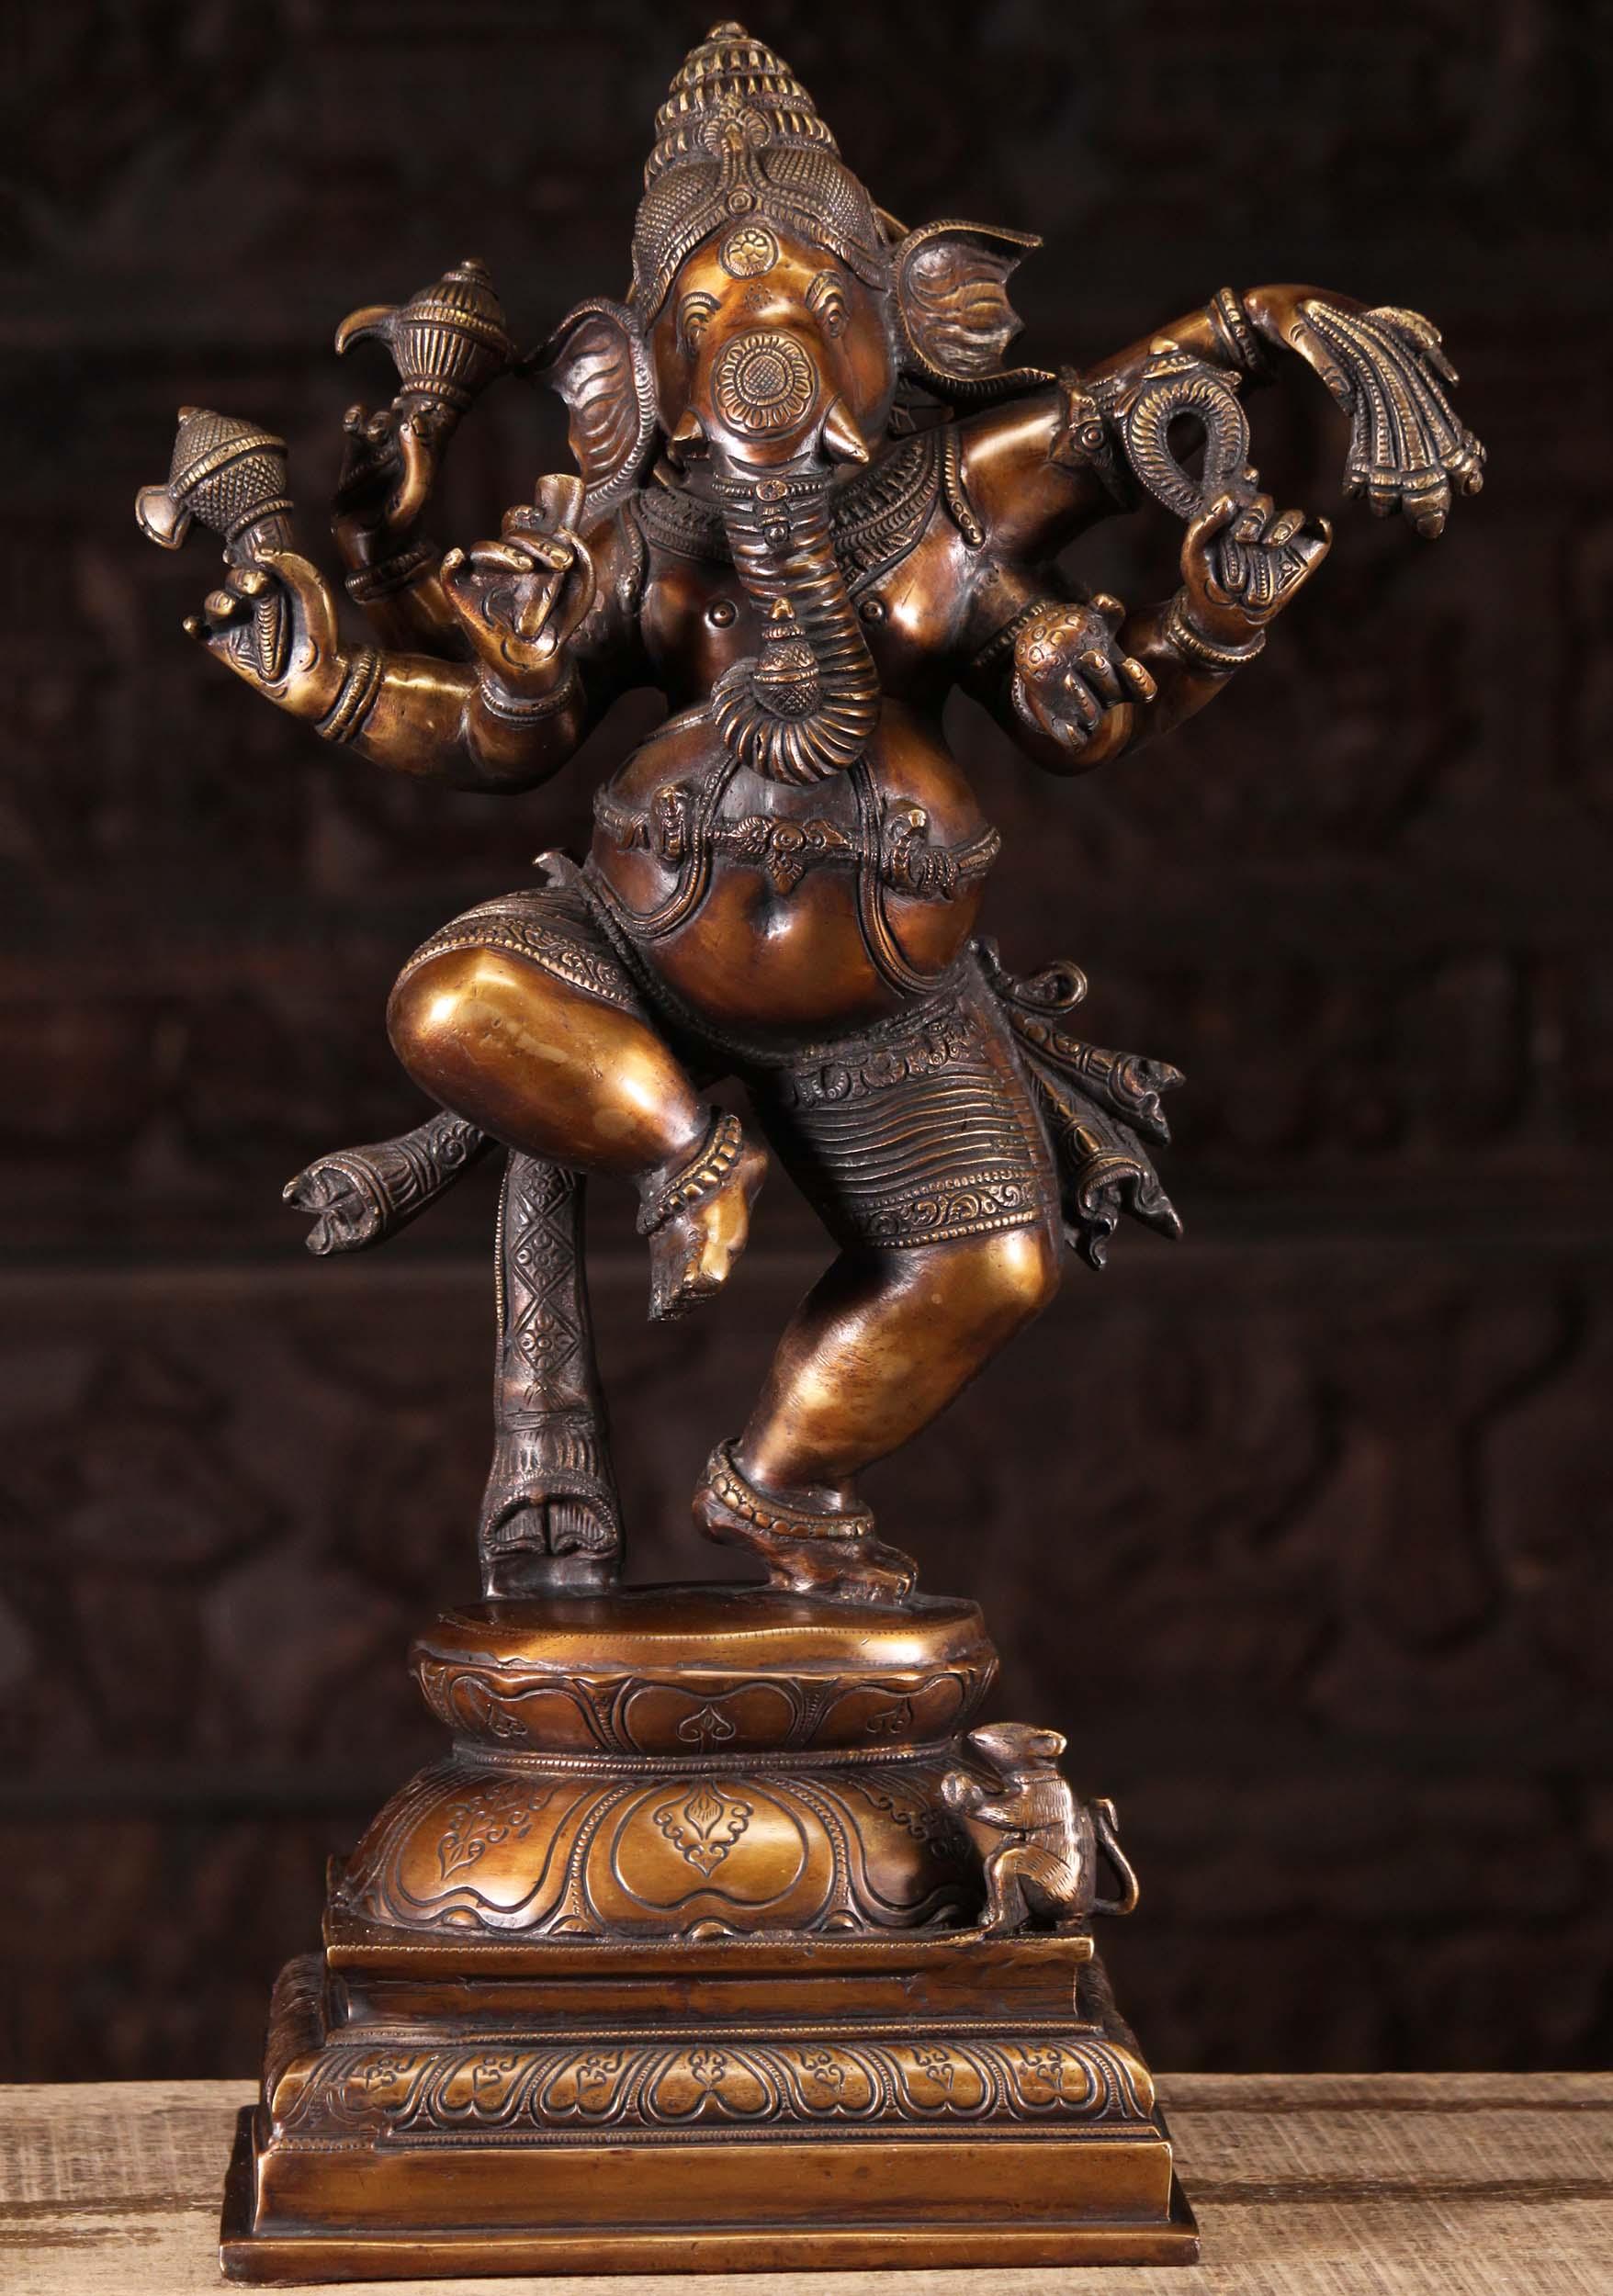 Brass Dancing Ganesha Statue With 6 Arms 23 110bs125 Hindu Gods Buddha Statues